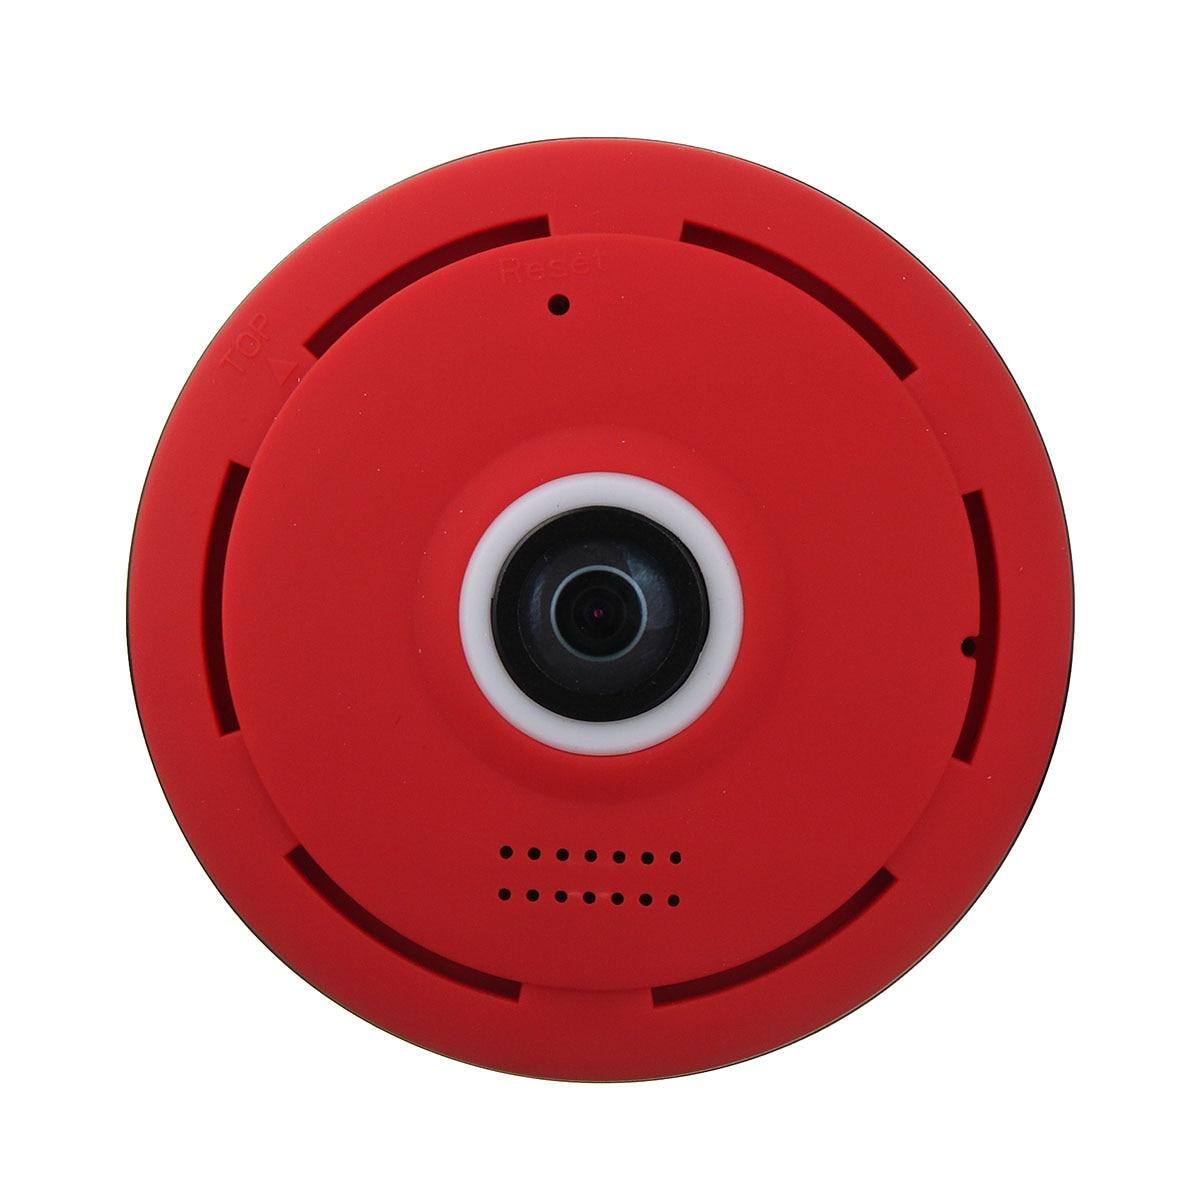 Mini 360 Degree Wireless Fisheye Wifi IP Camera Night Vision 1080P HD Panoramic Surveillance Home Security<br>